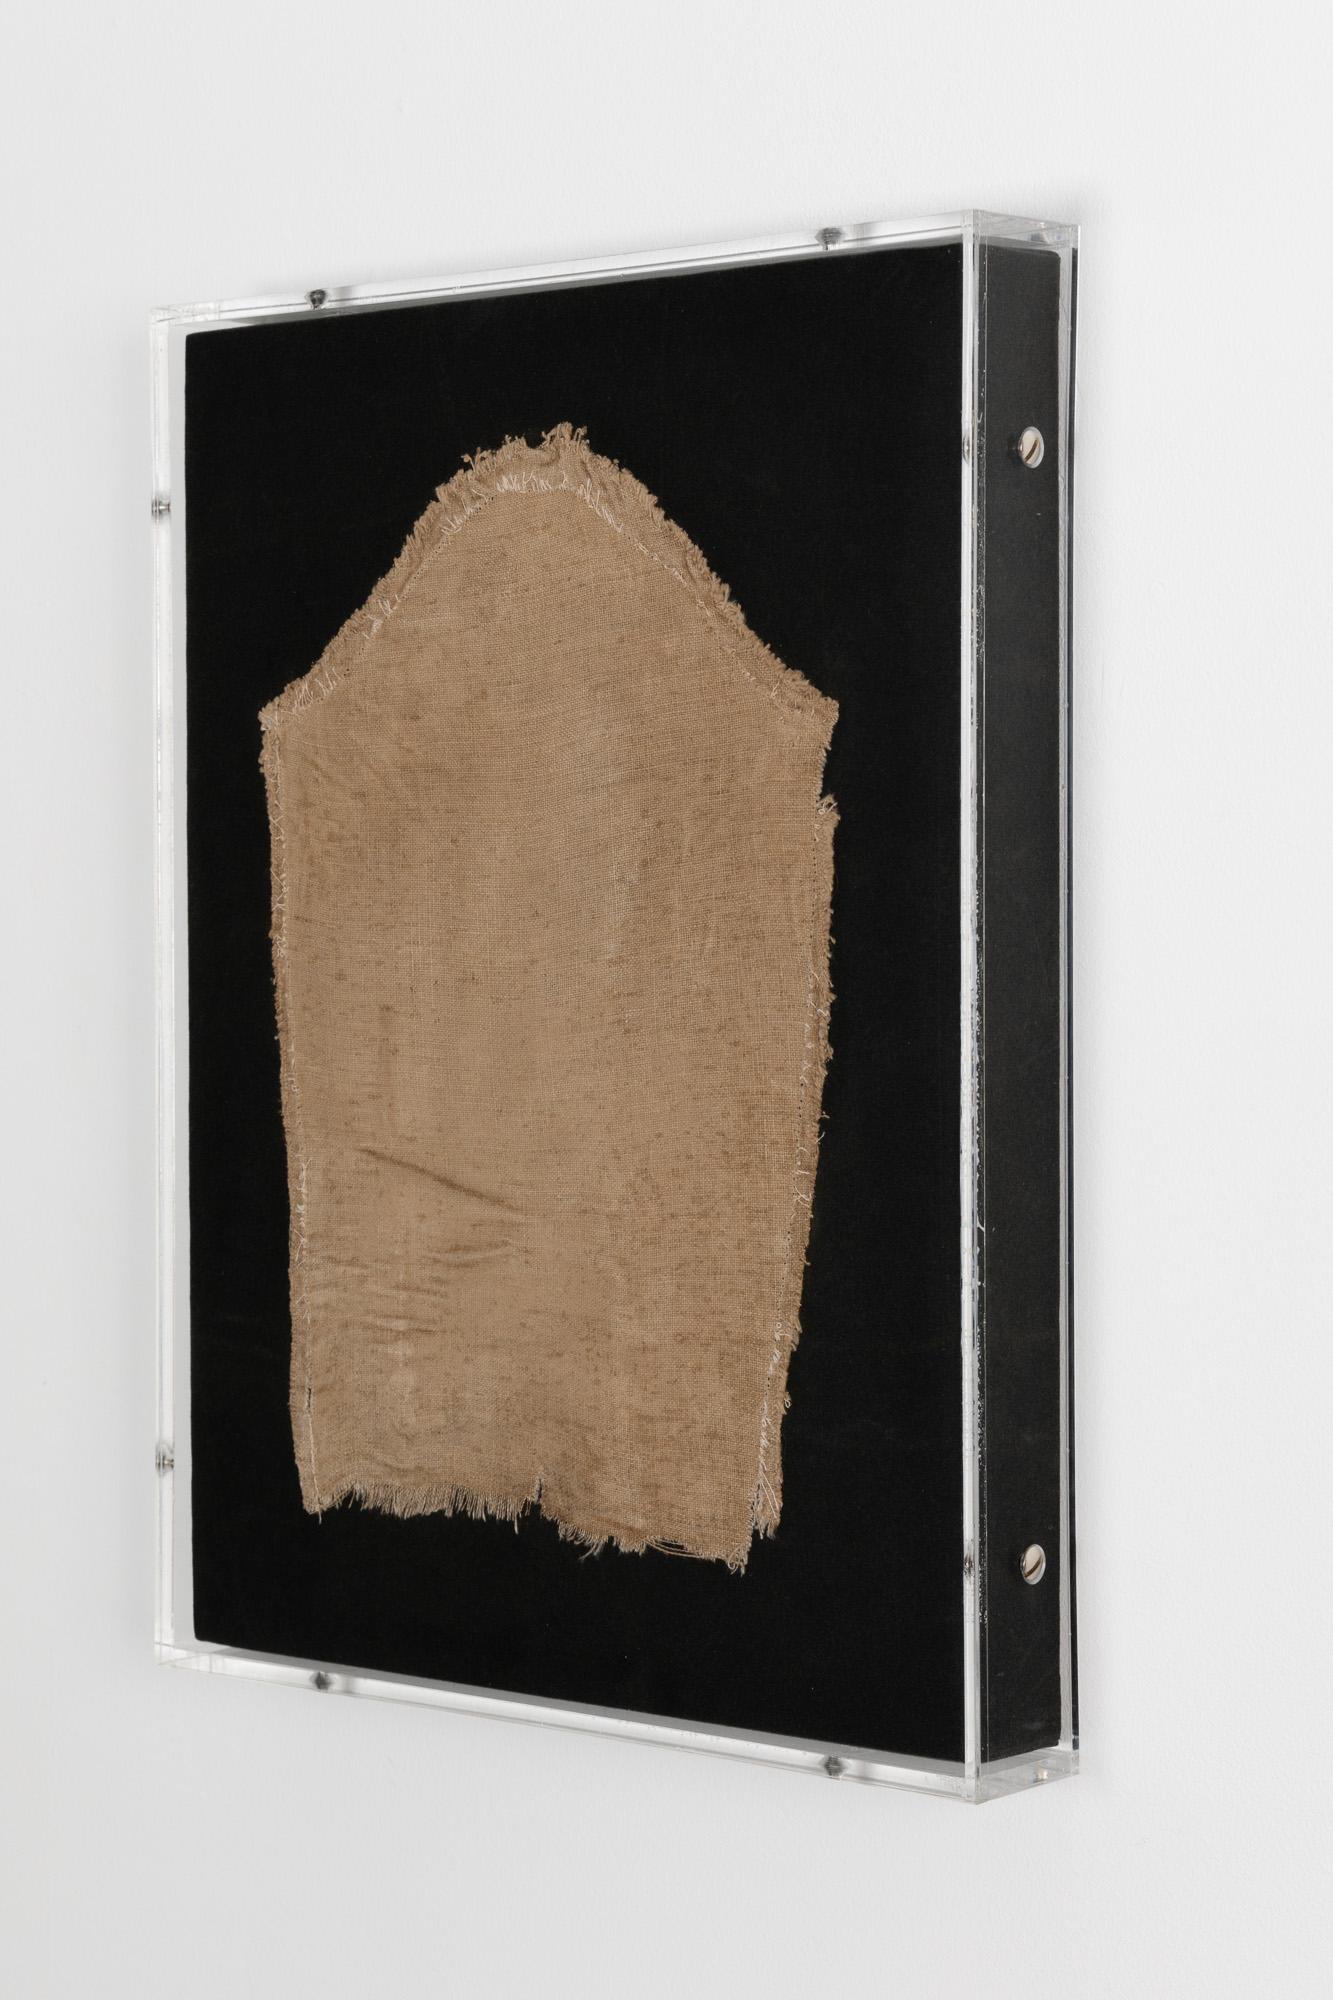 Minimal Information Waxcloth, 2020. Textile in artist's frame (plexiglass, wood and aluminum), 41,5 x 31,5 x 4,5 cm